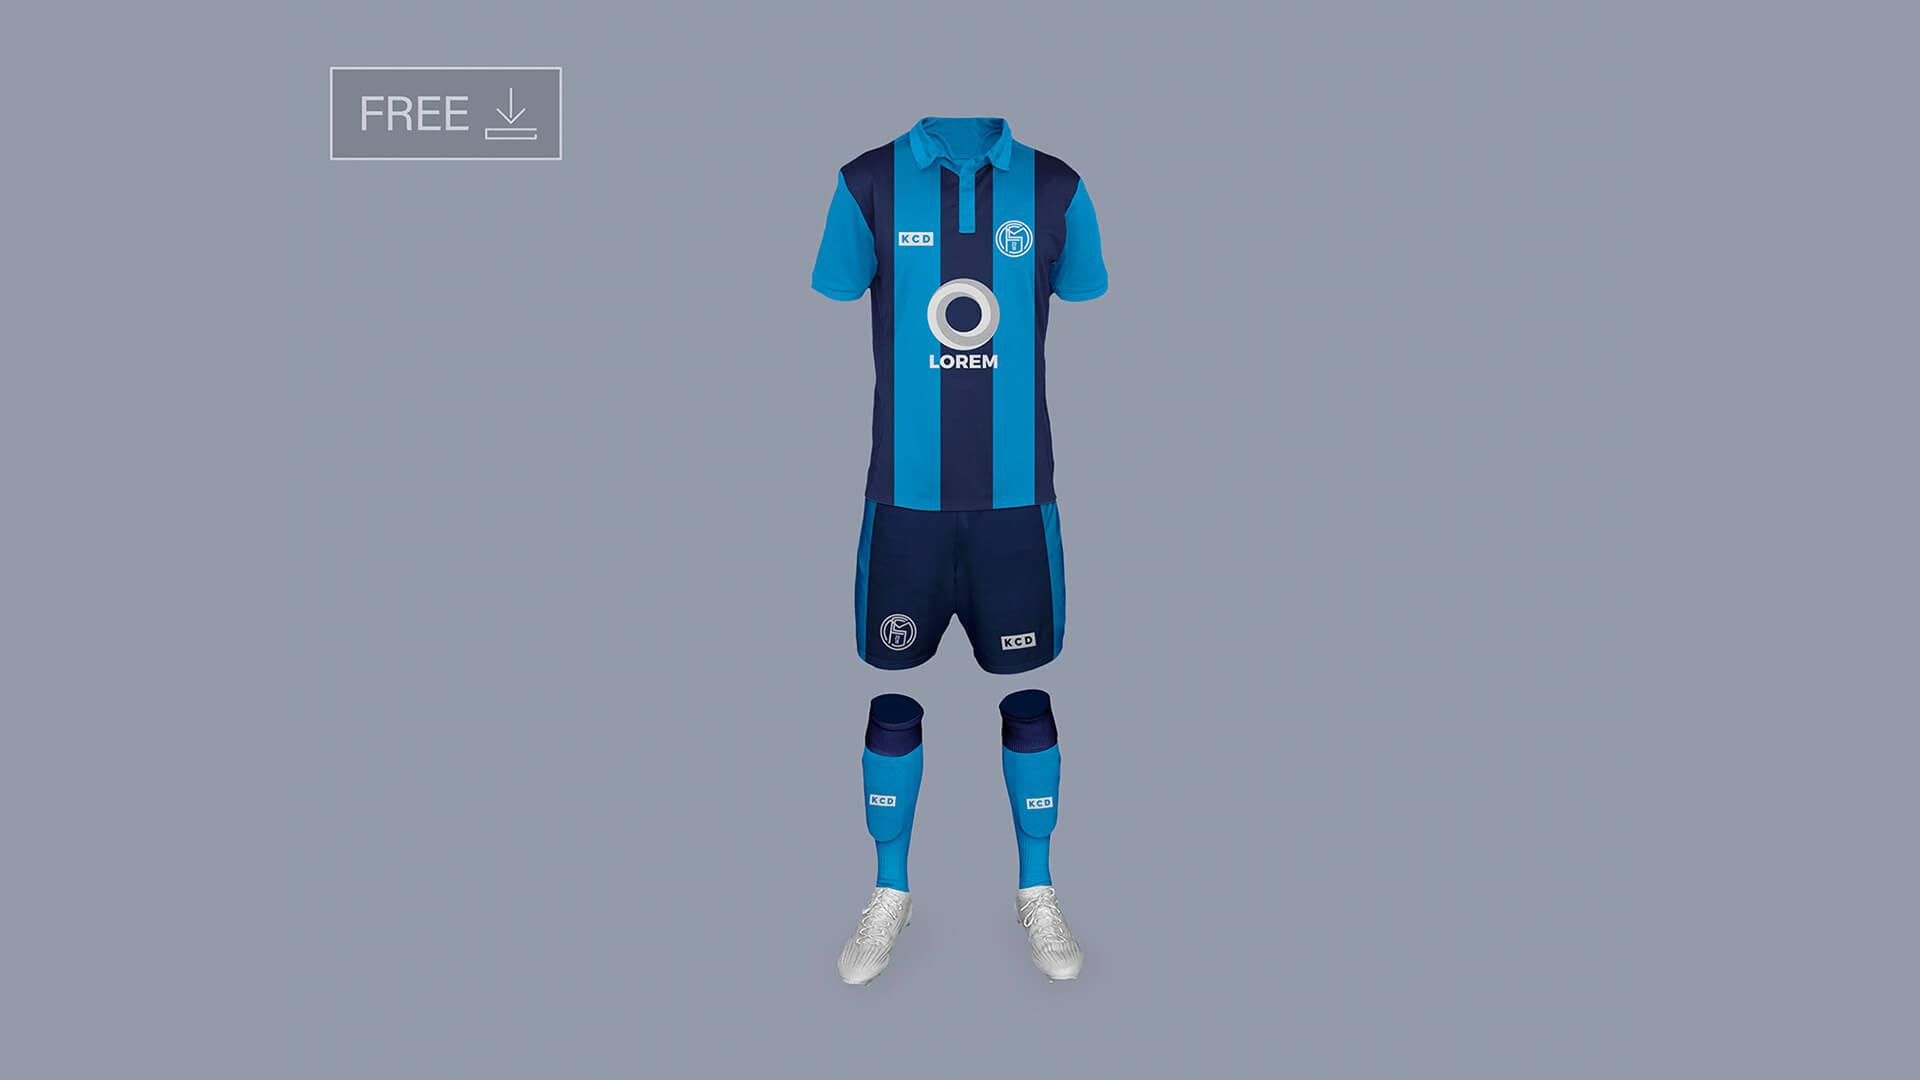 Download mockup camiseta raglan psd. Mockup De Uniforme De Futebol Gratis Criativo Design